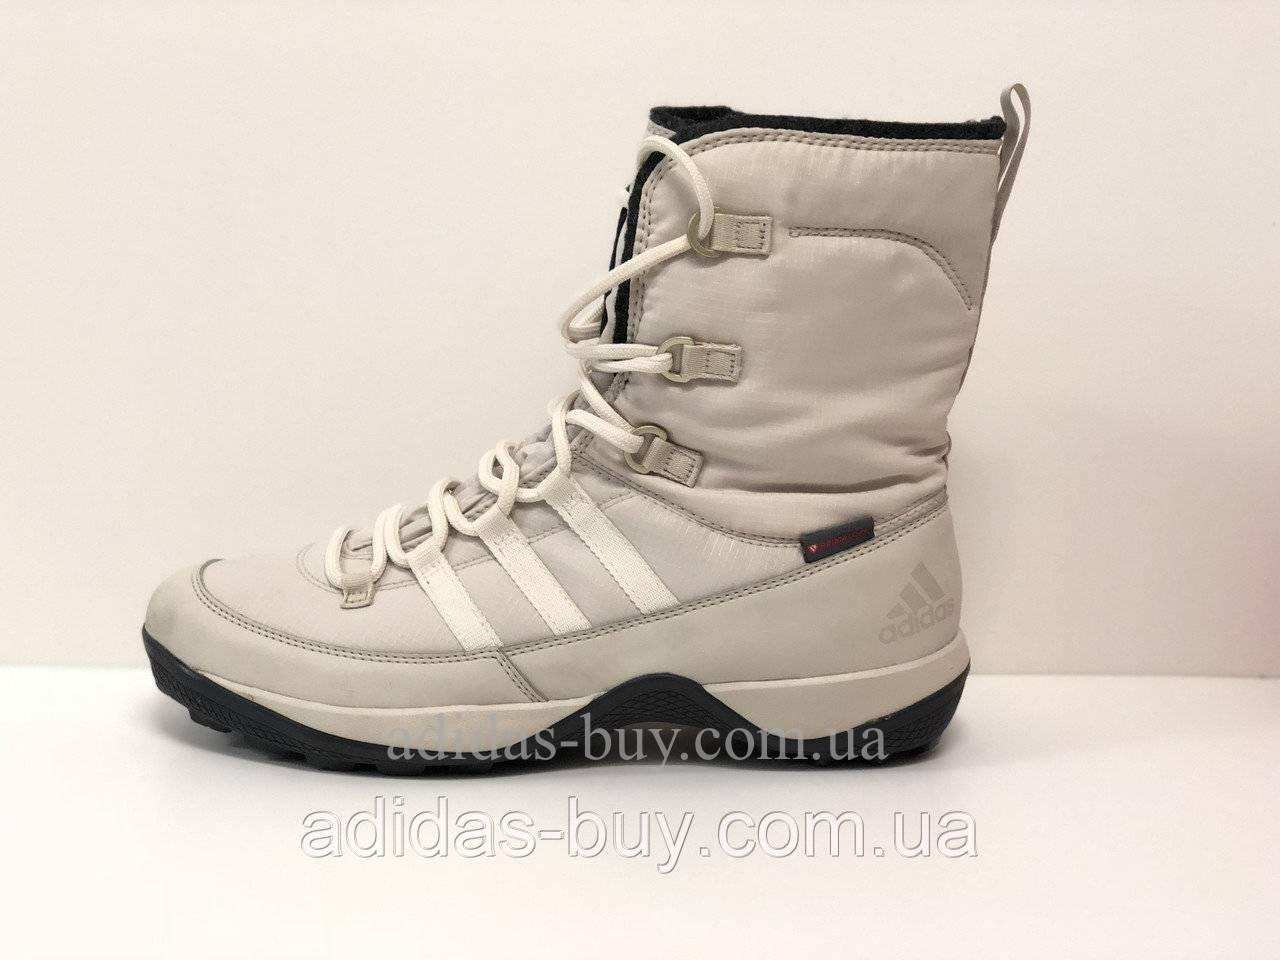 Женские ботинки сапоги Adidas CLIMAHEAT LIBRIA PEARL b33118